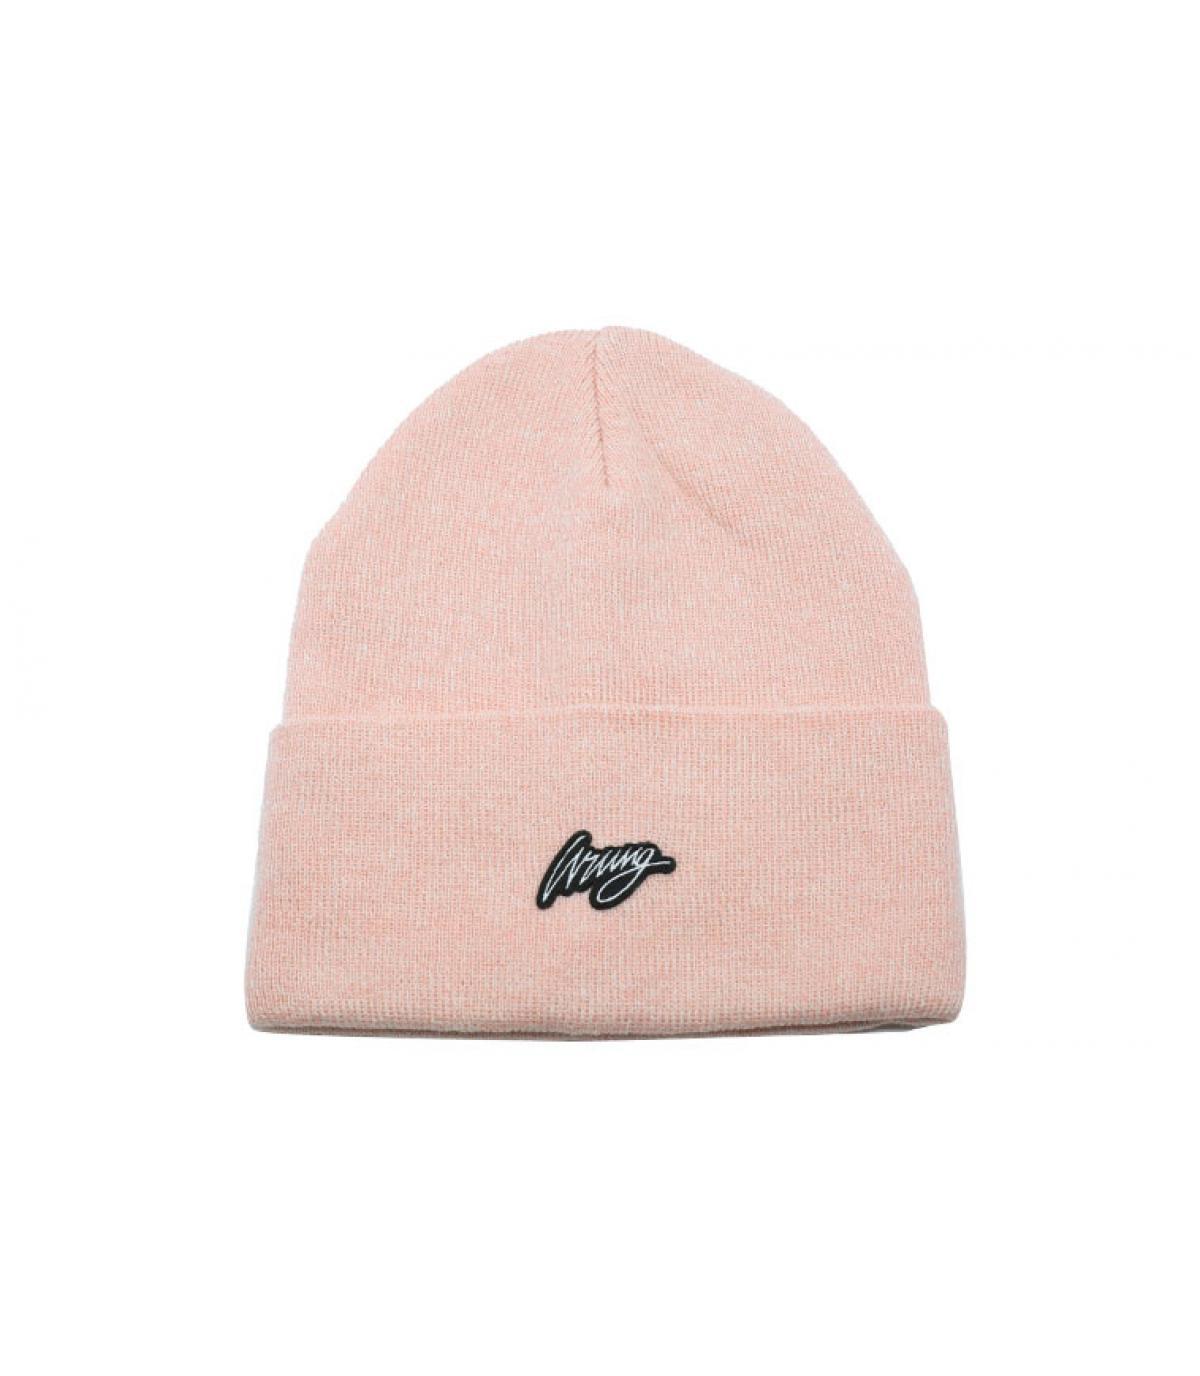 Details Trill Beanie heather pink - afbeeling 2